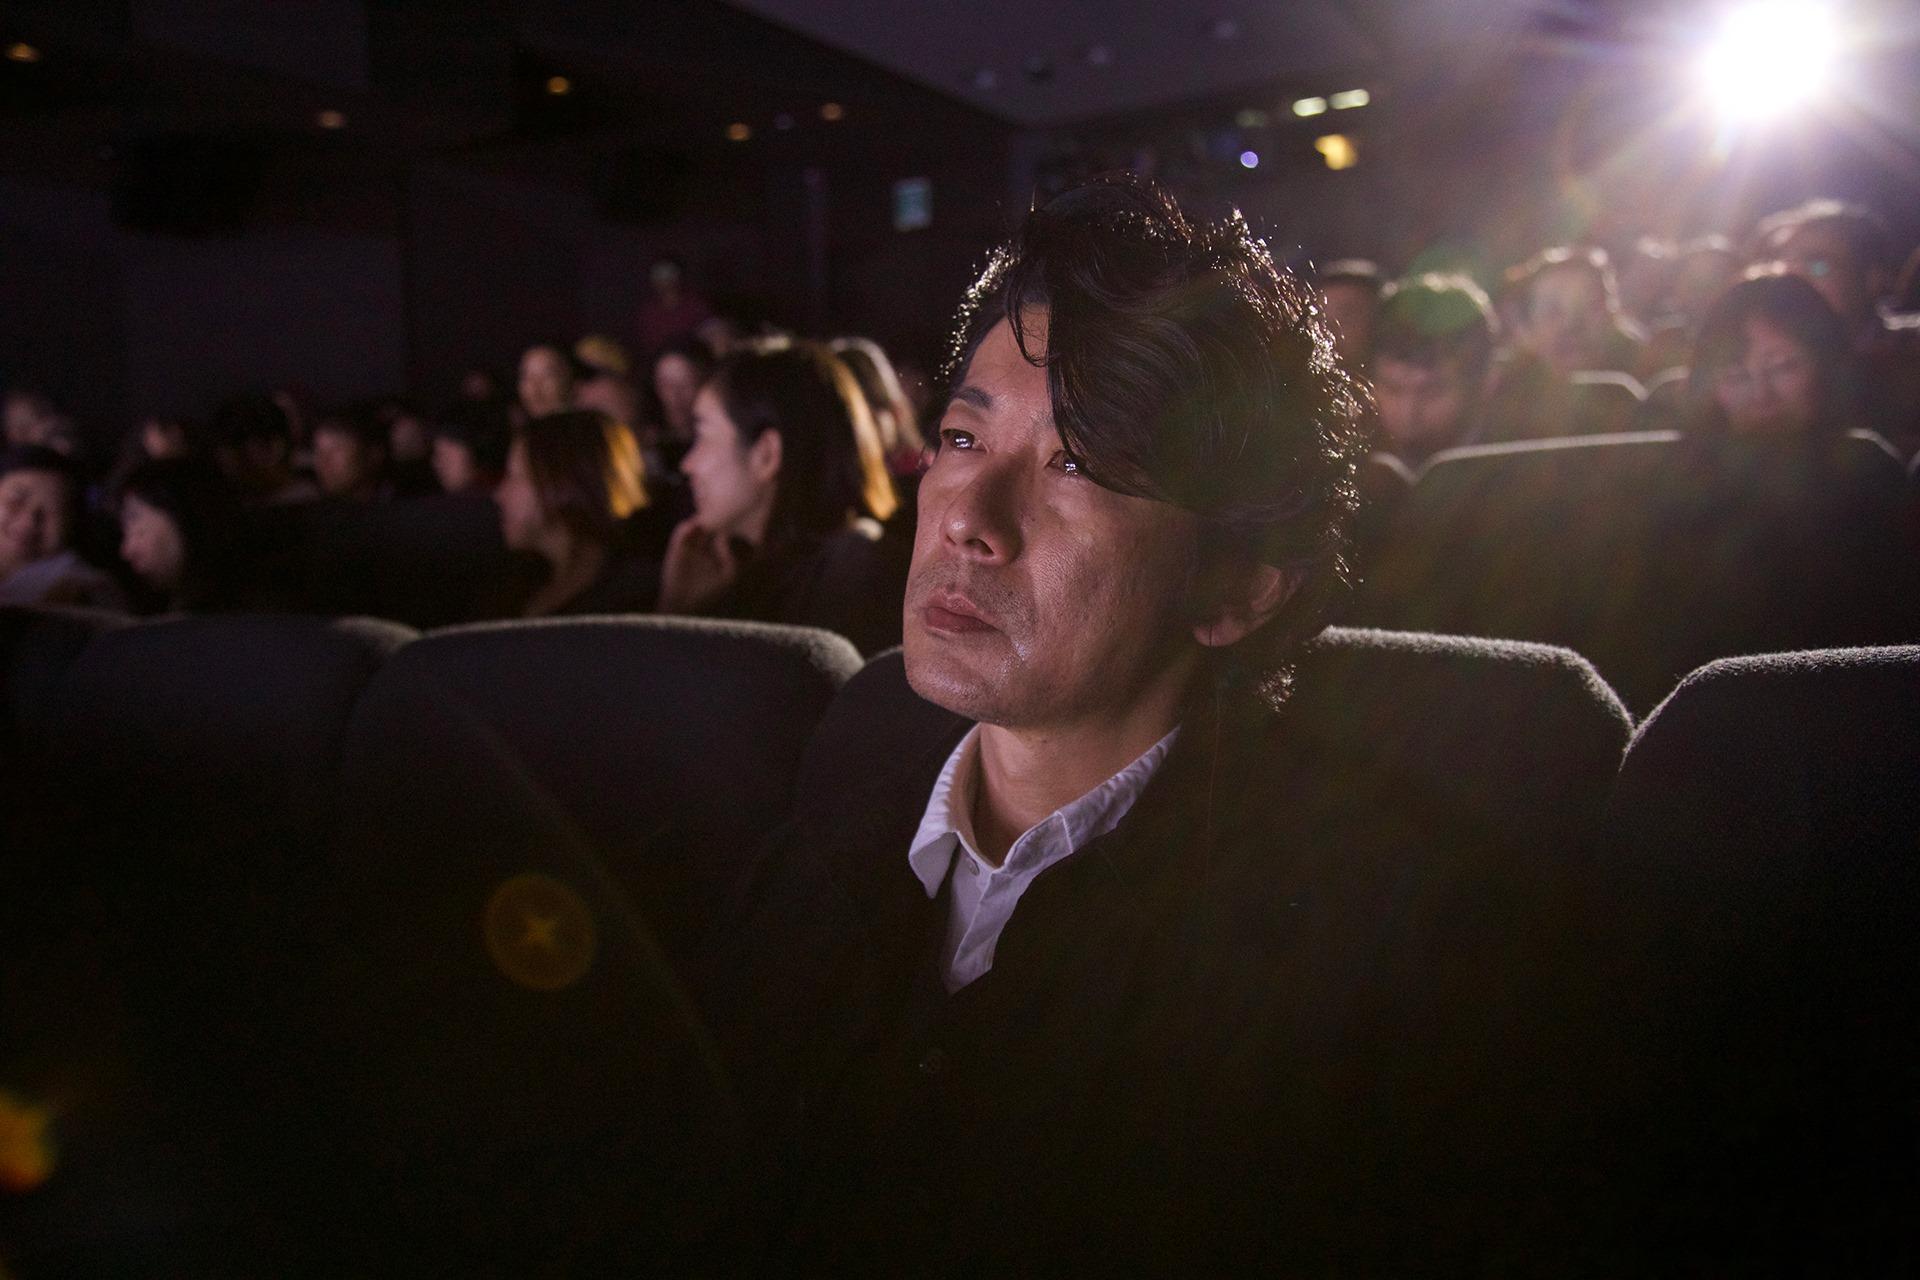 Cinema no Pátio: Esplendor, de Naomi Kawase | gnration